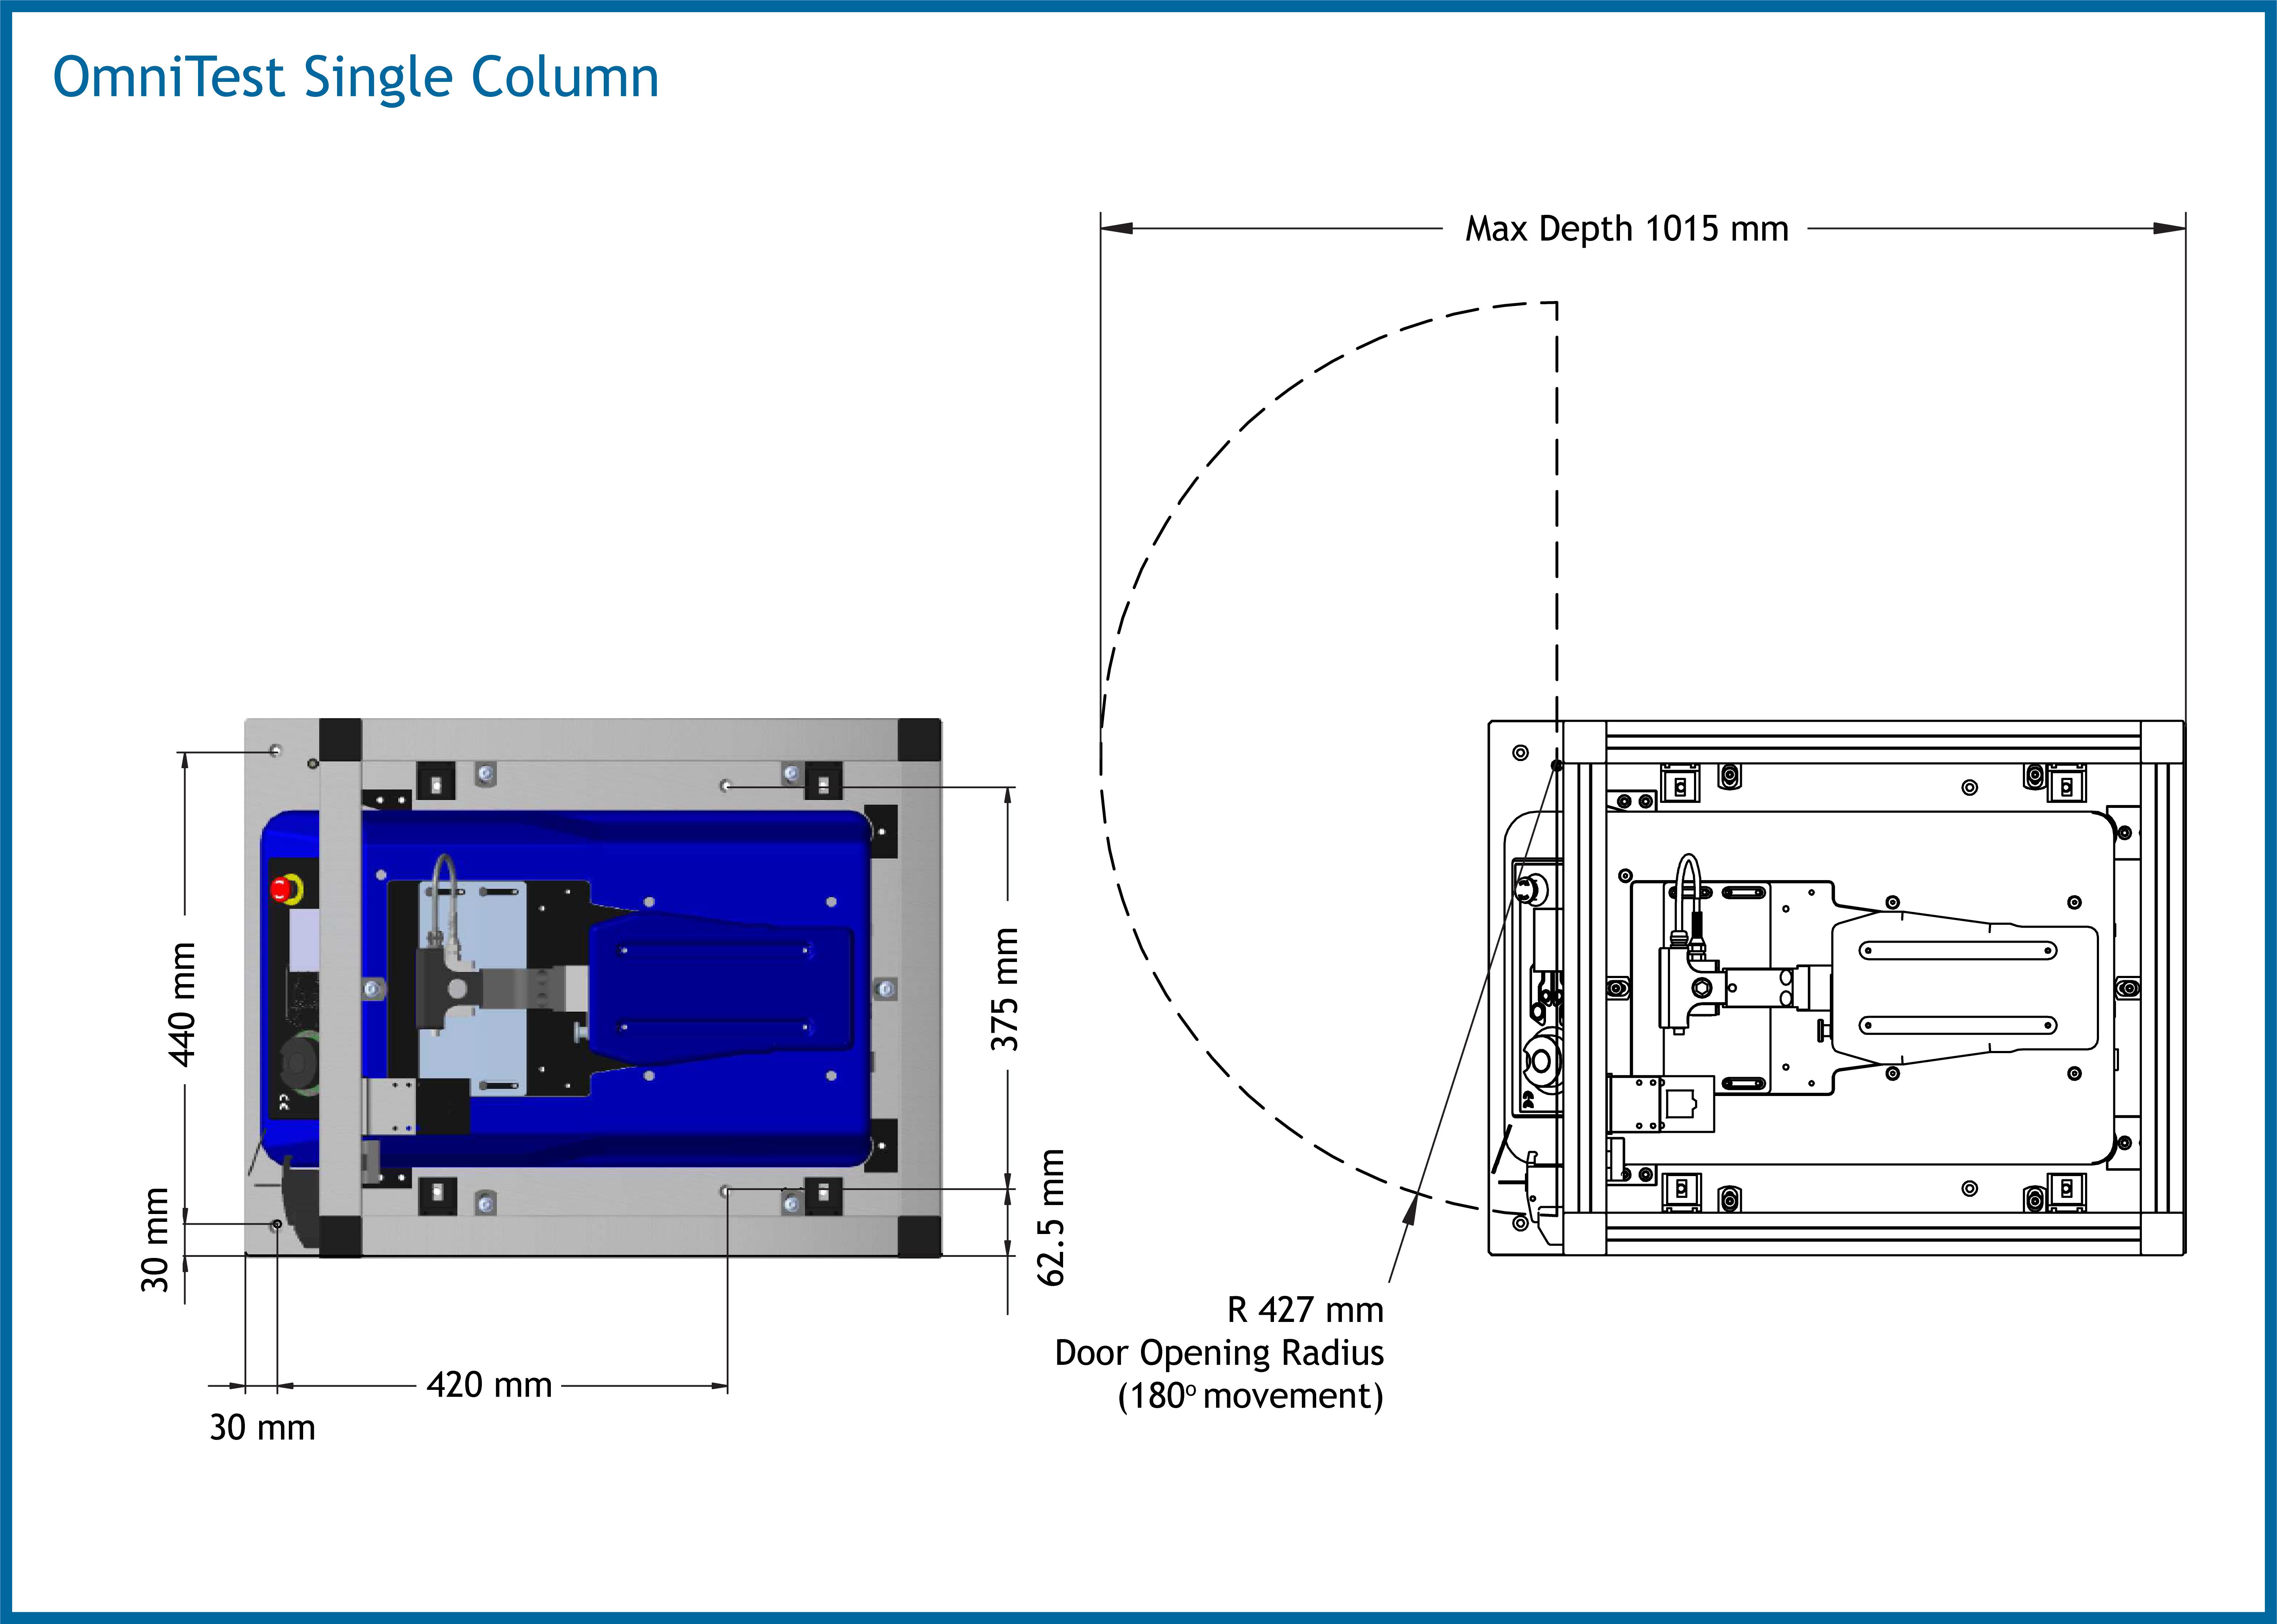 OmniTest Single Column Dimensions